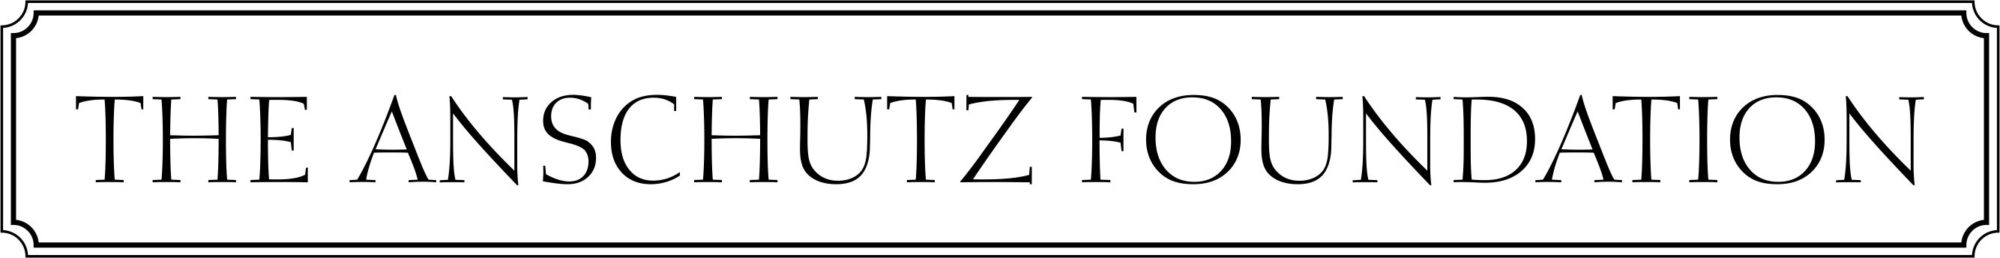 The-Anschutz-Foundation